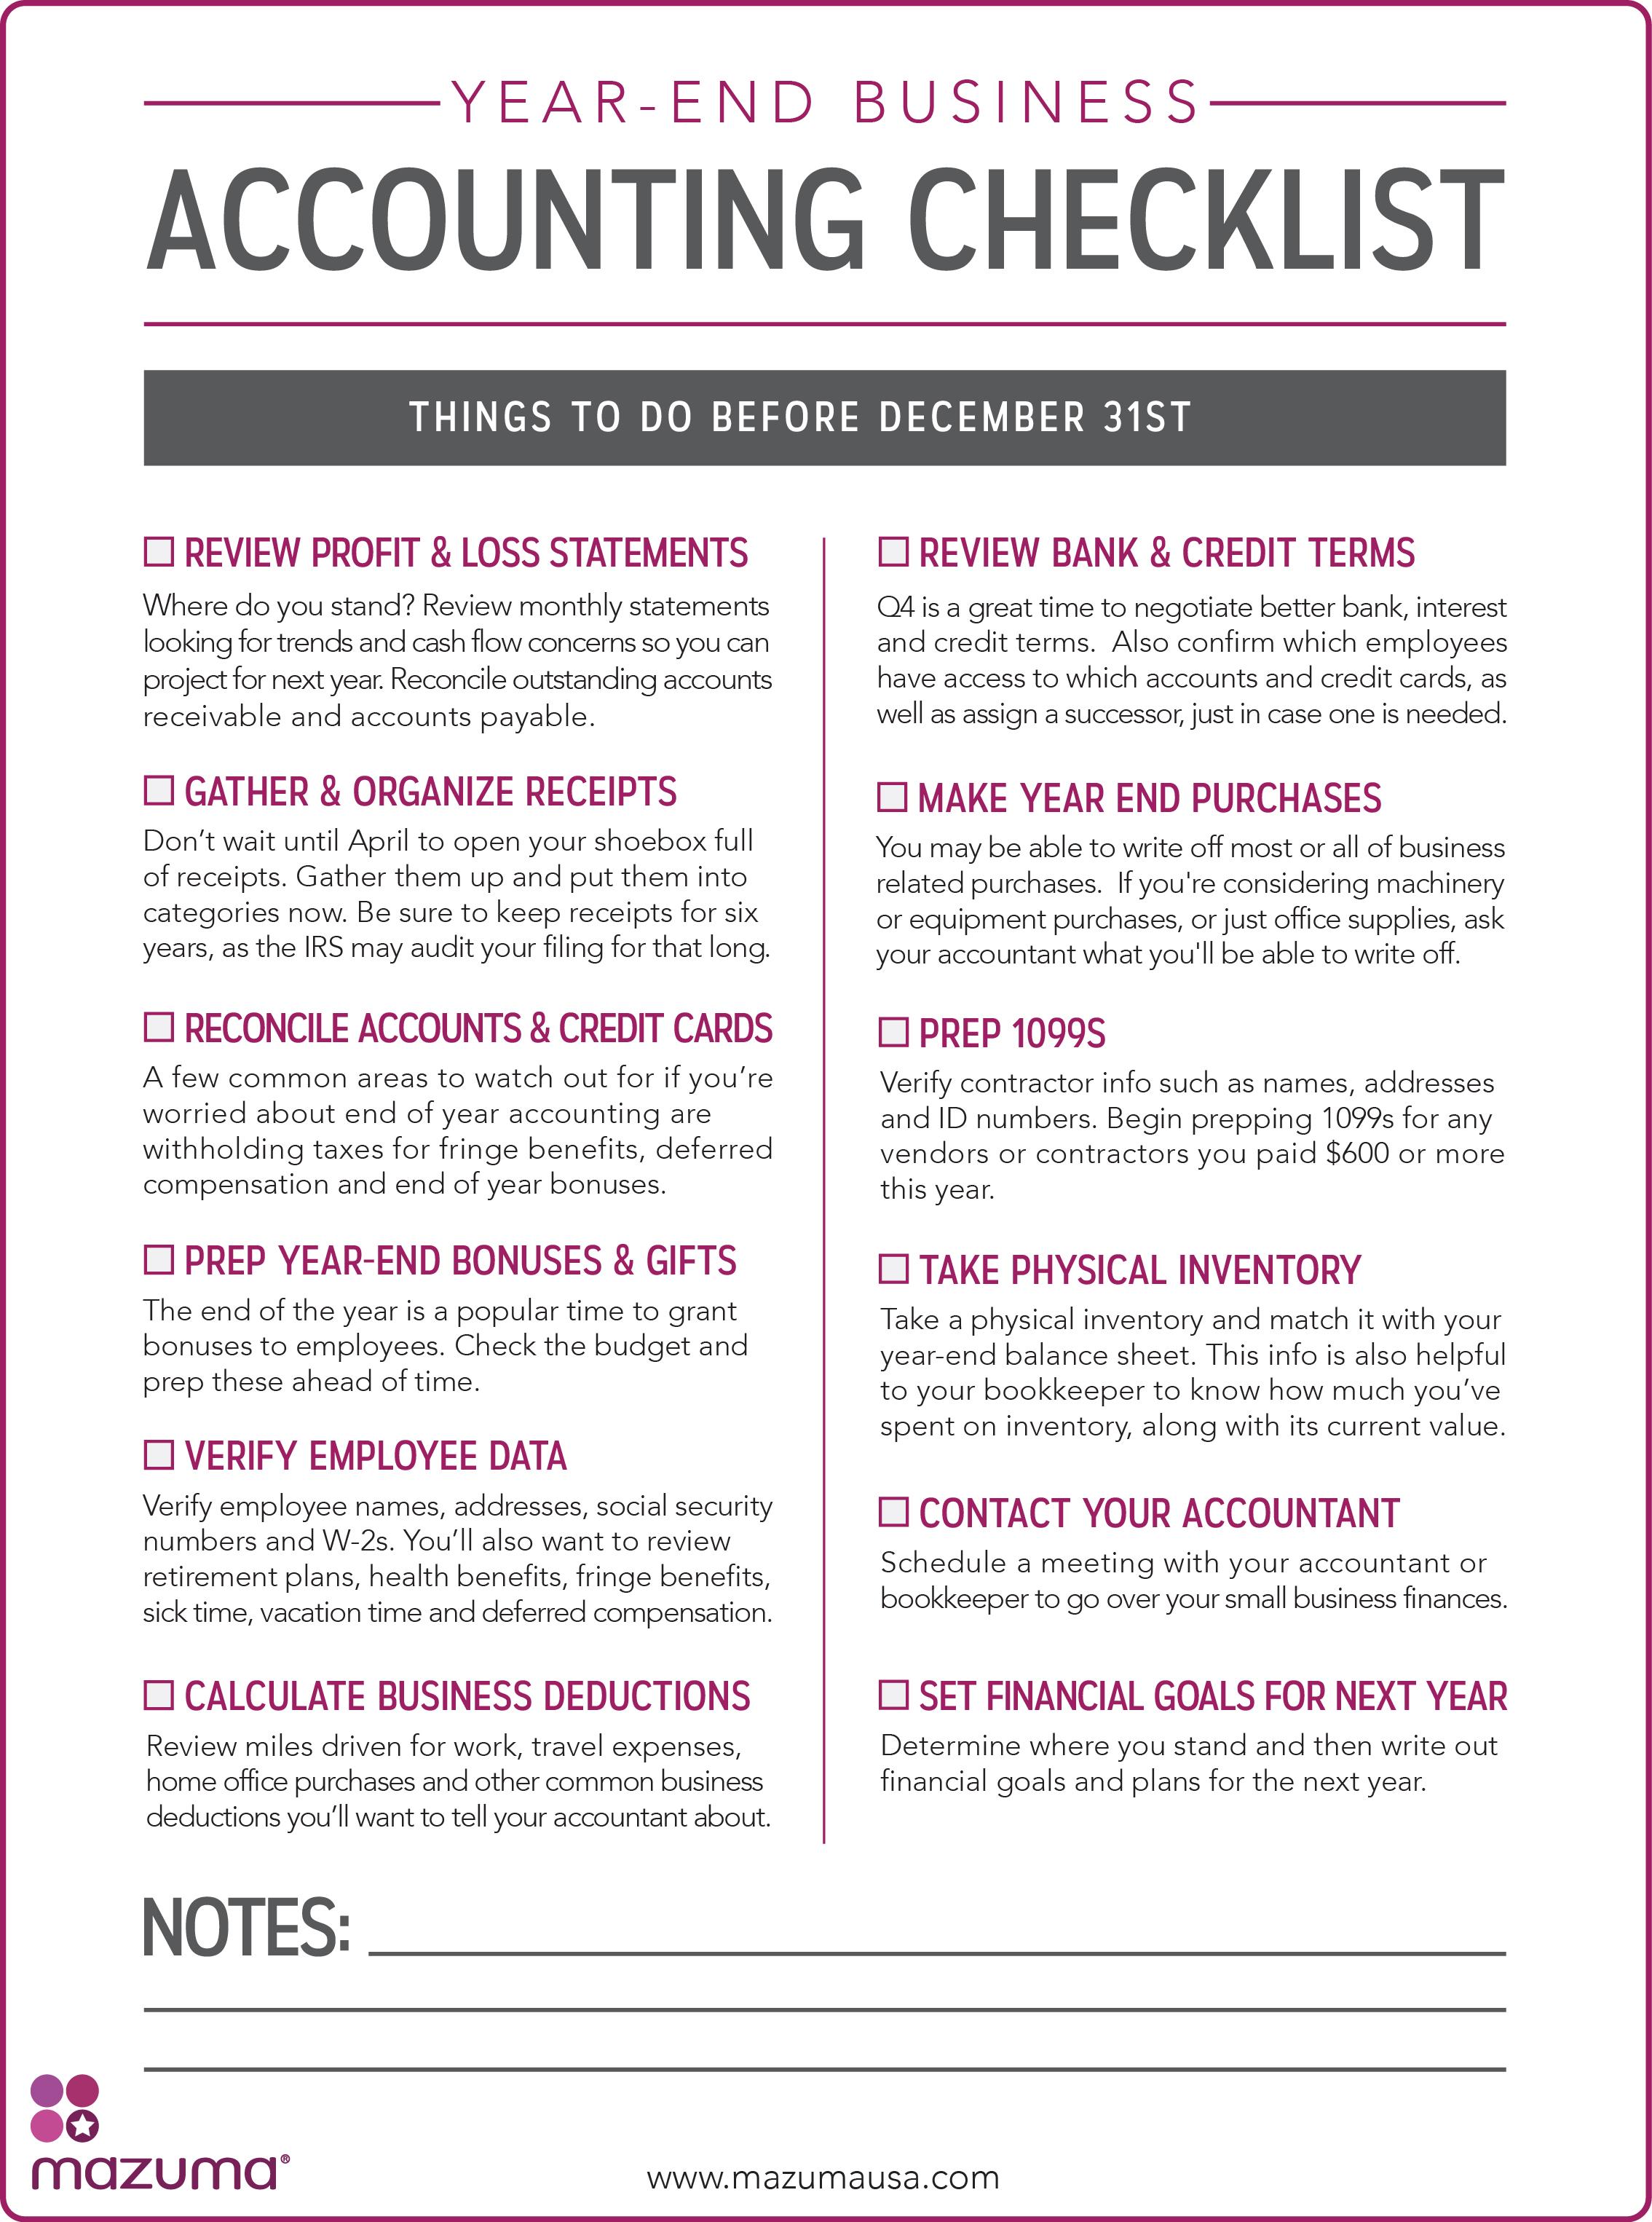 Mazuma S Year End Business Accounting Checklist